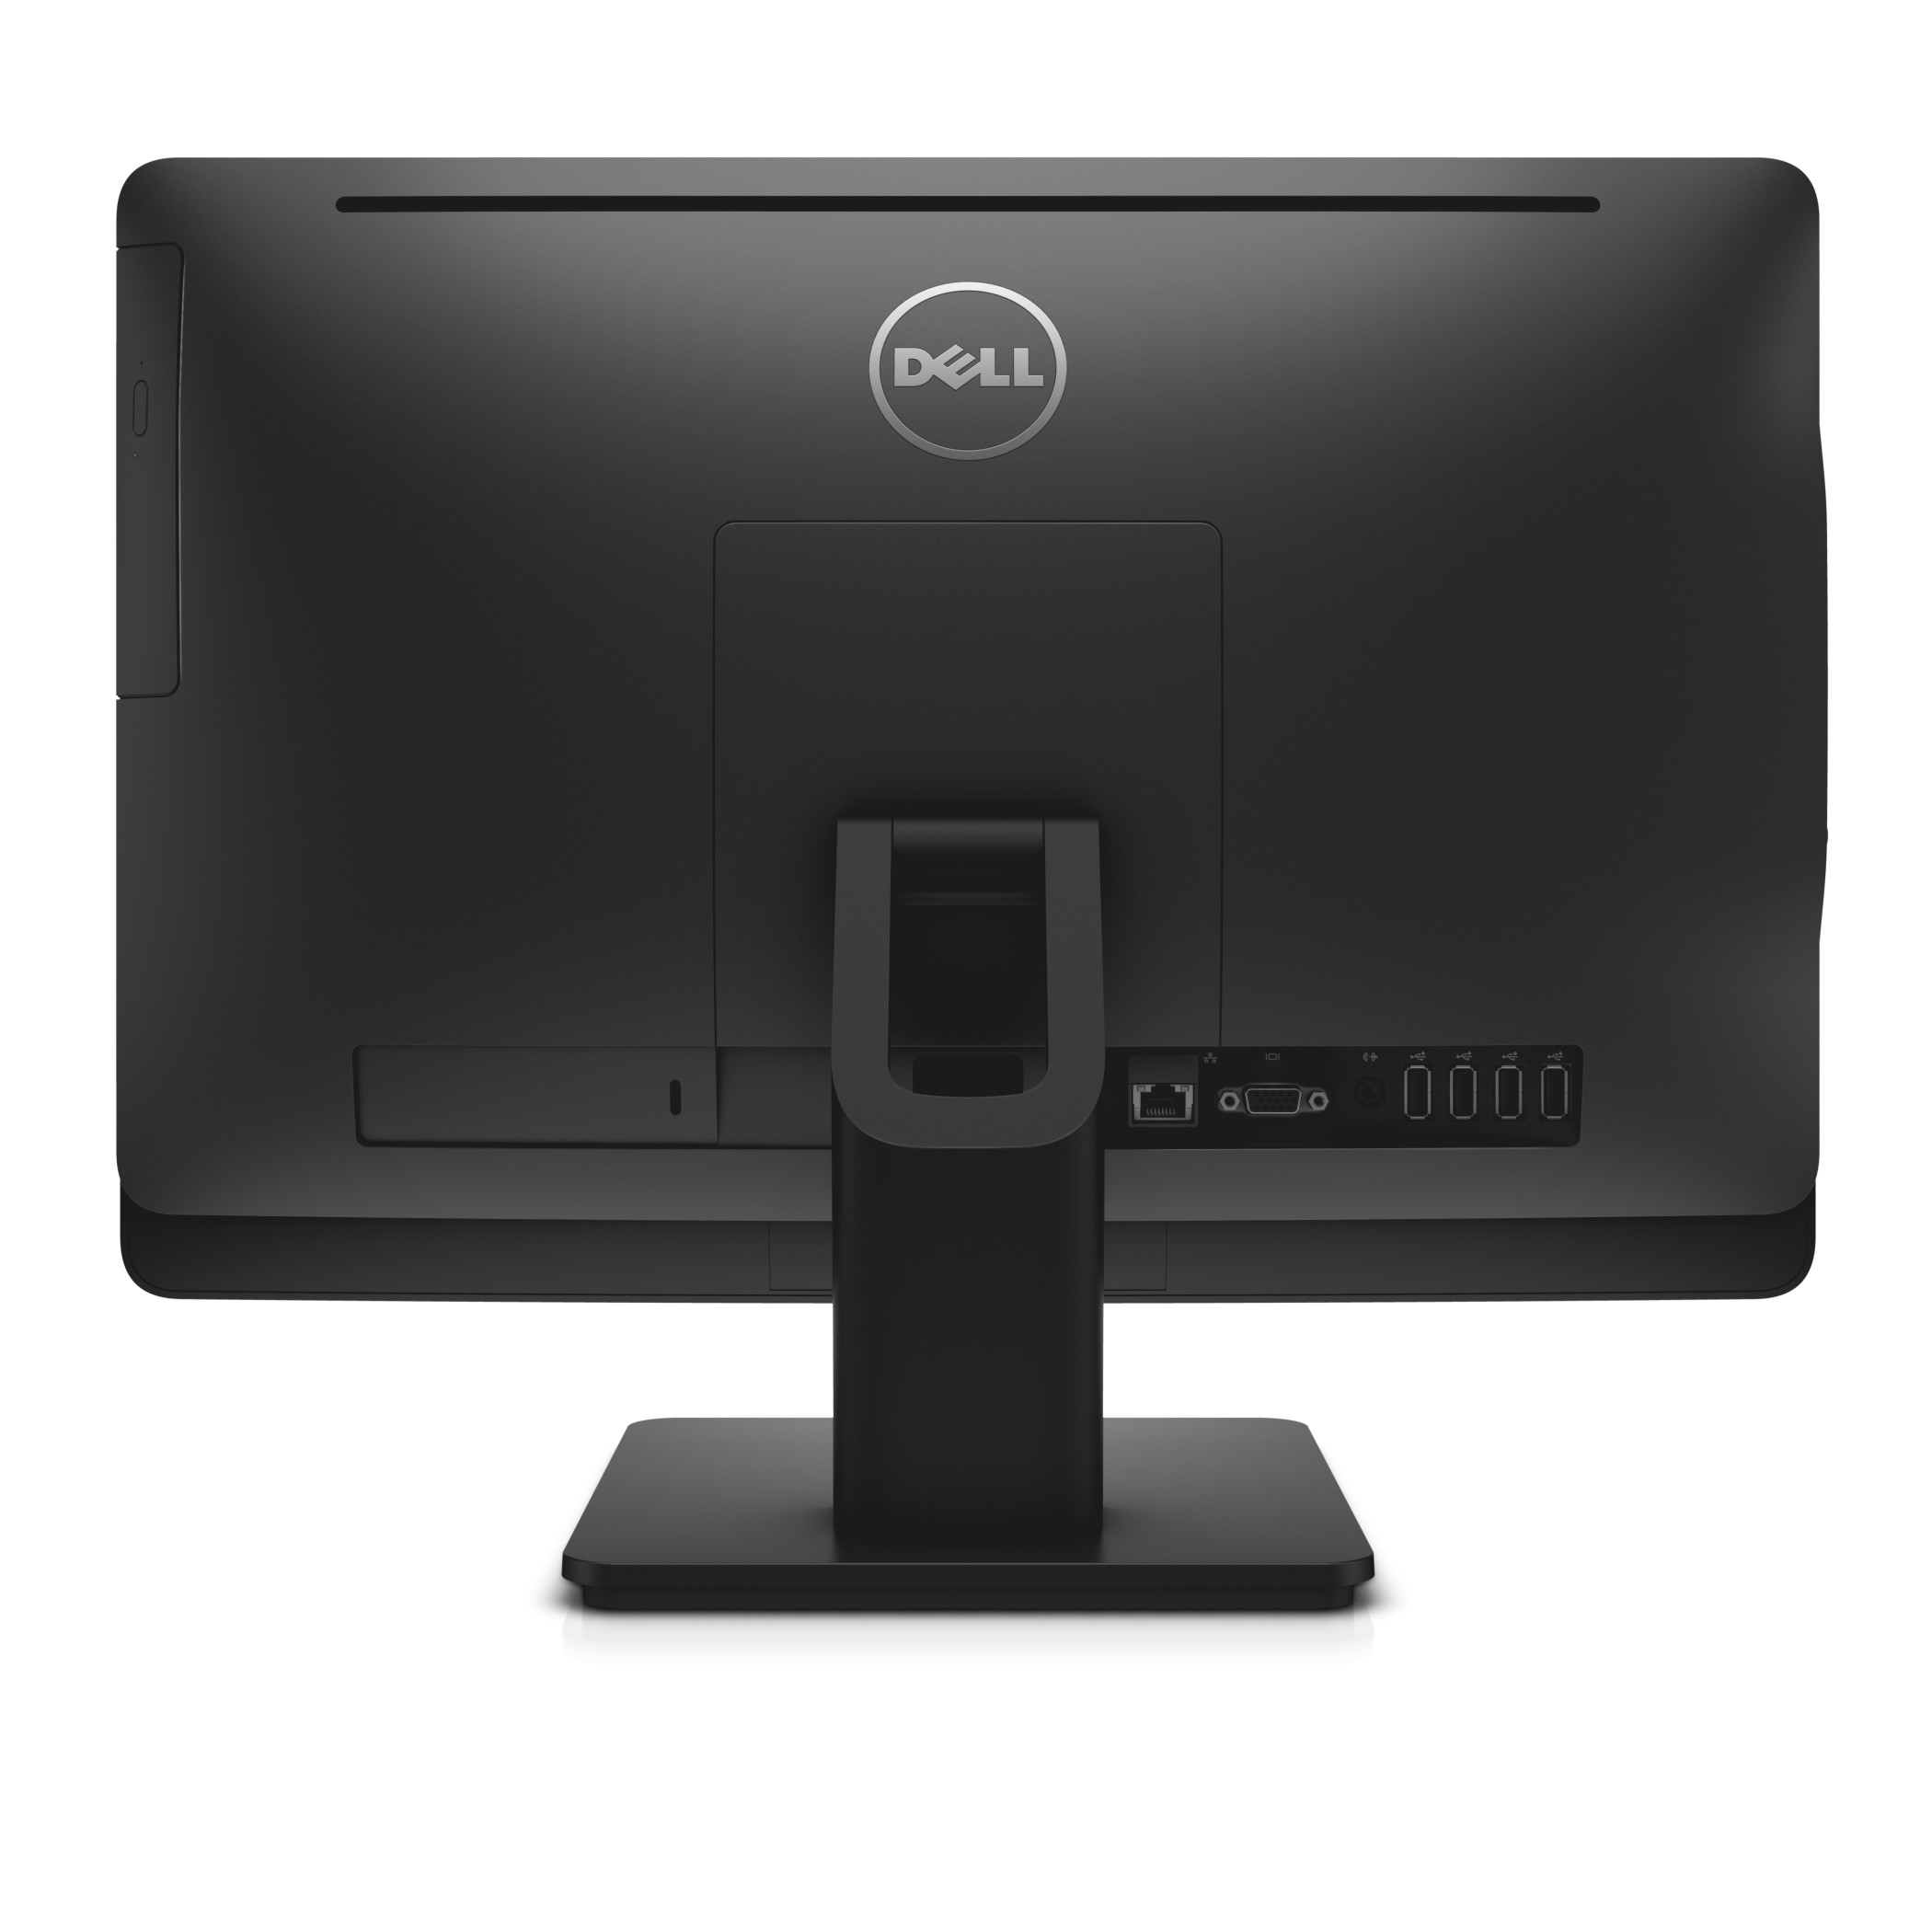 "DELL OptiPlex 3030 3GHz i5-4590S 19.5"" 1600 x 900pixels Black"